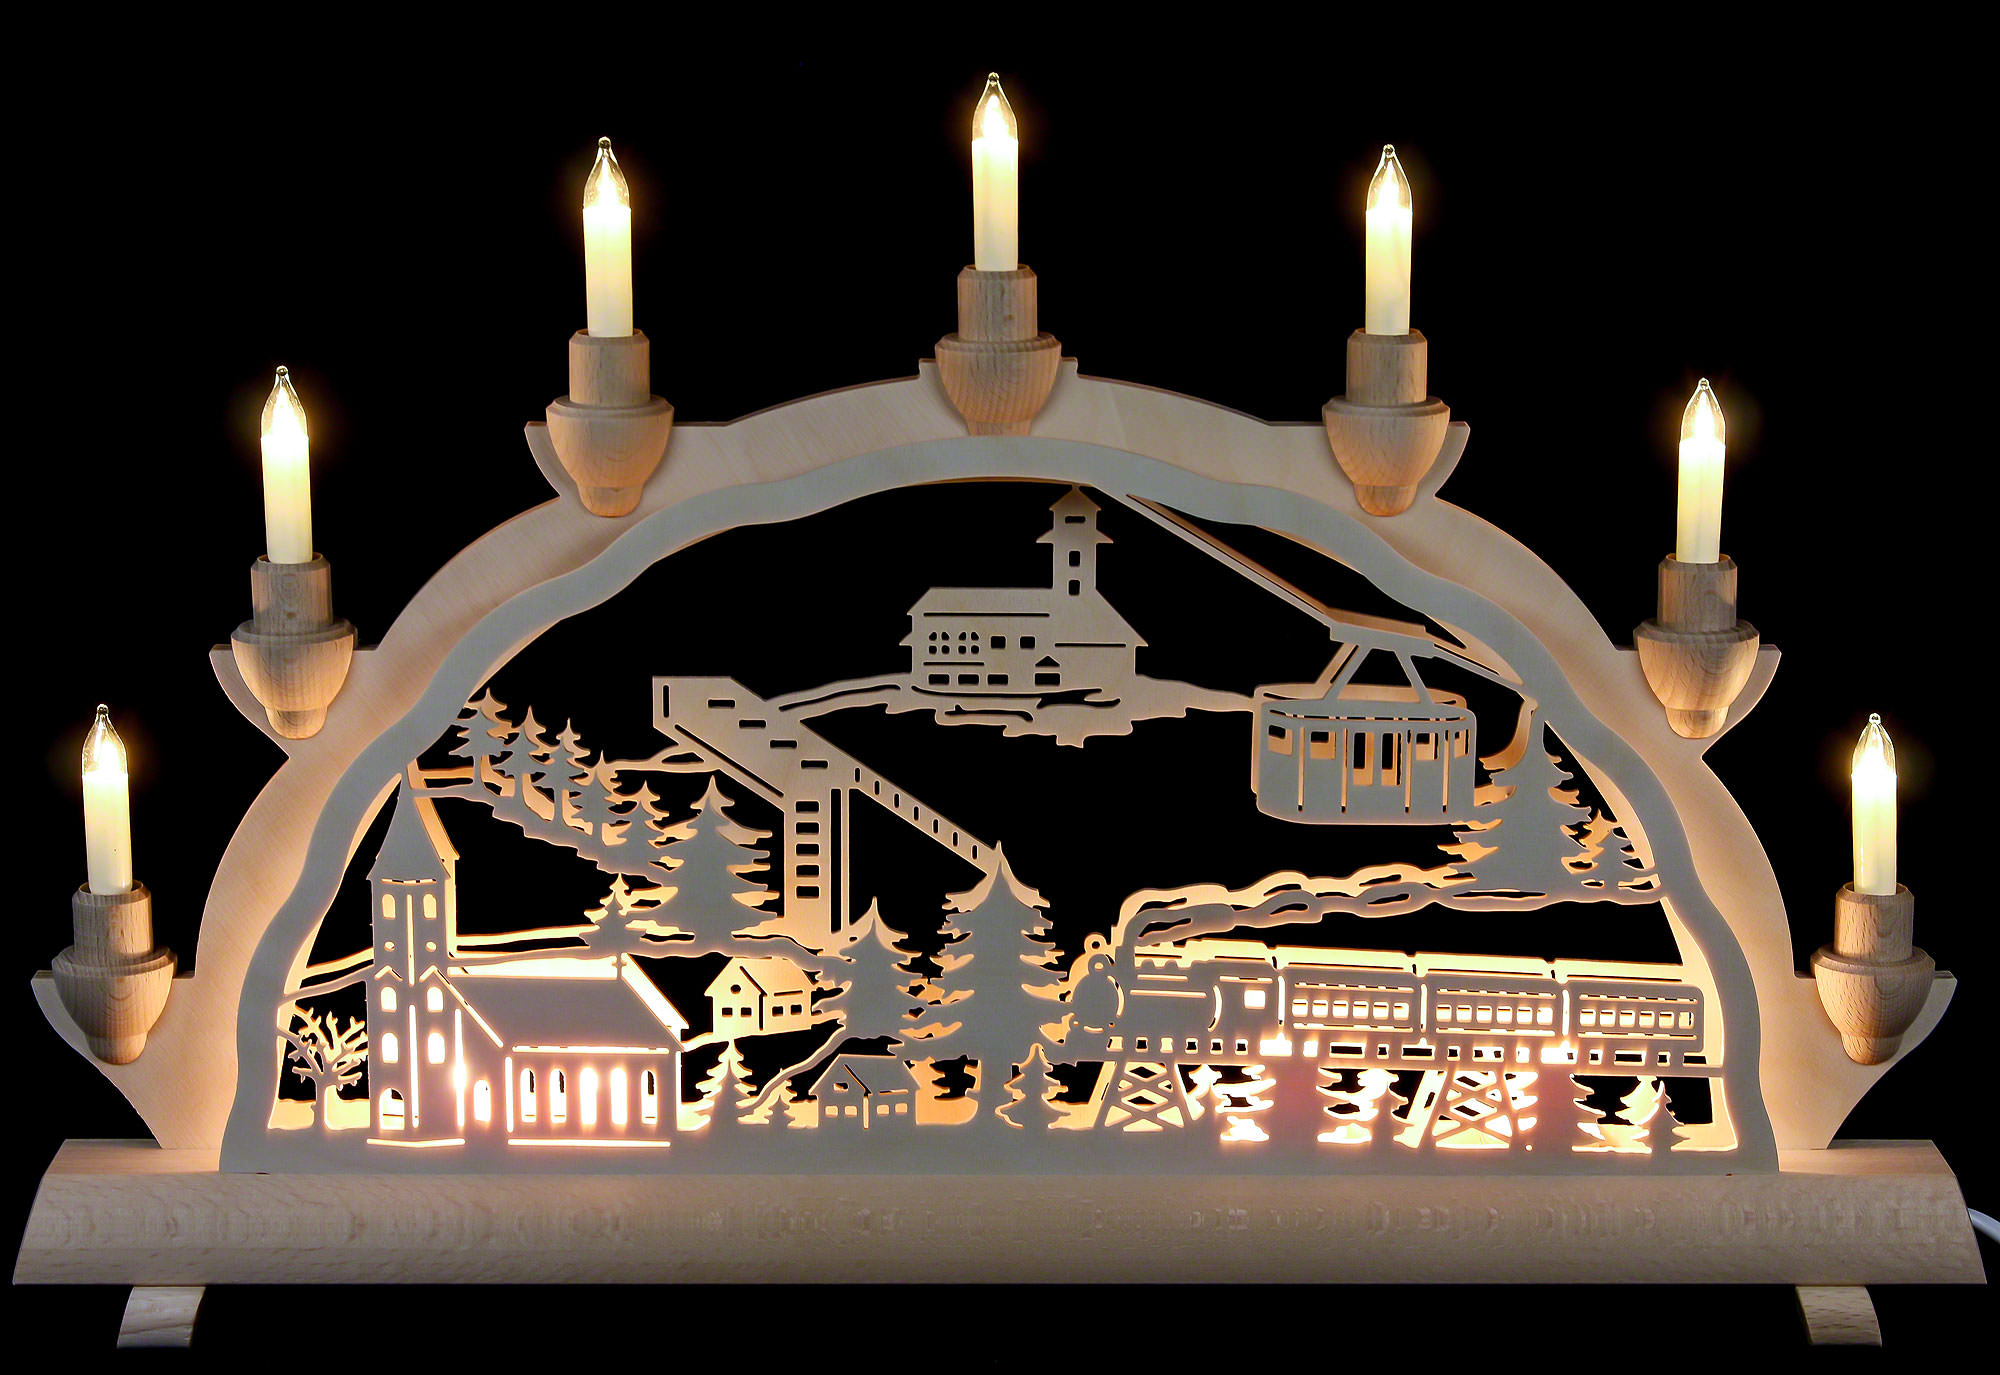 3D-Doppelschwibbogen-Erzgebirge Palast